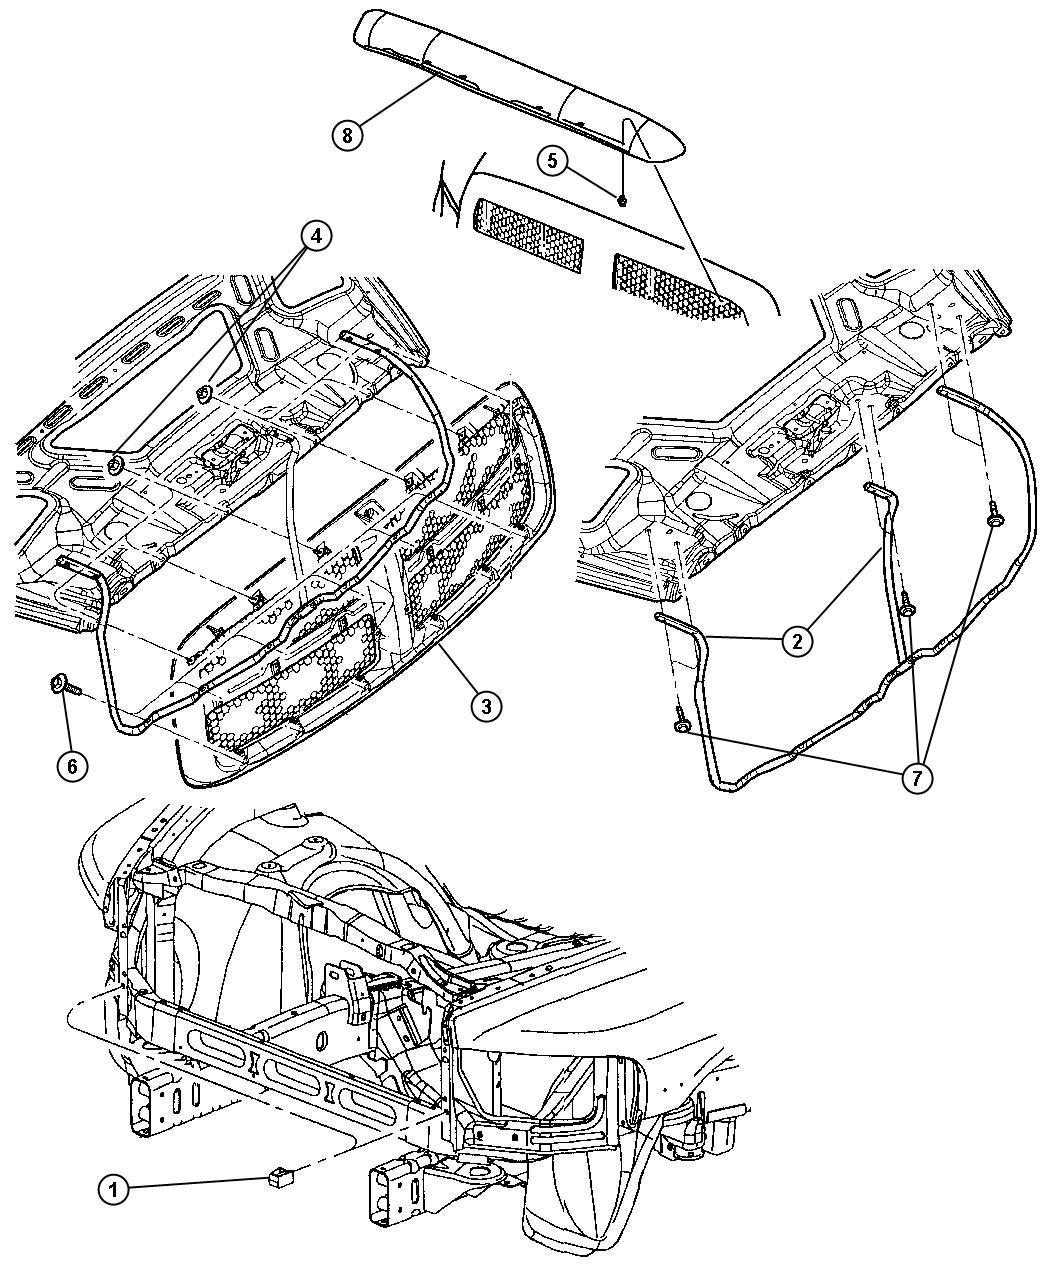 Dodge Ram 3500 Grille. Radiator. [body color grille] [xr